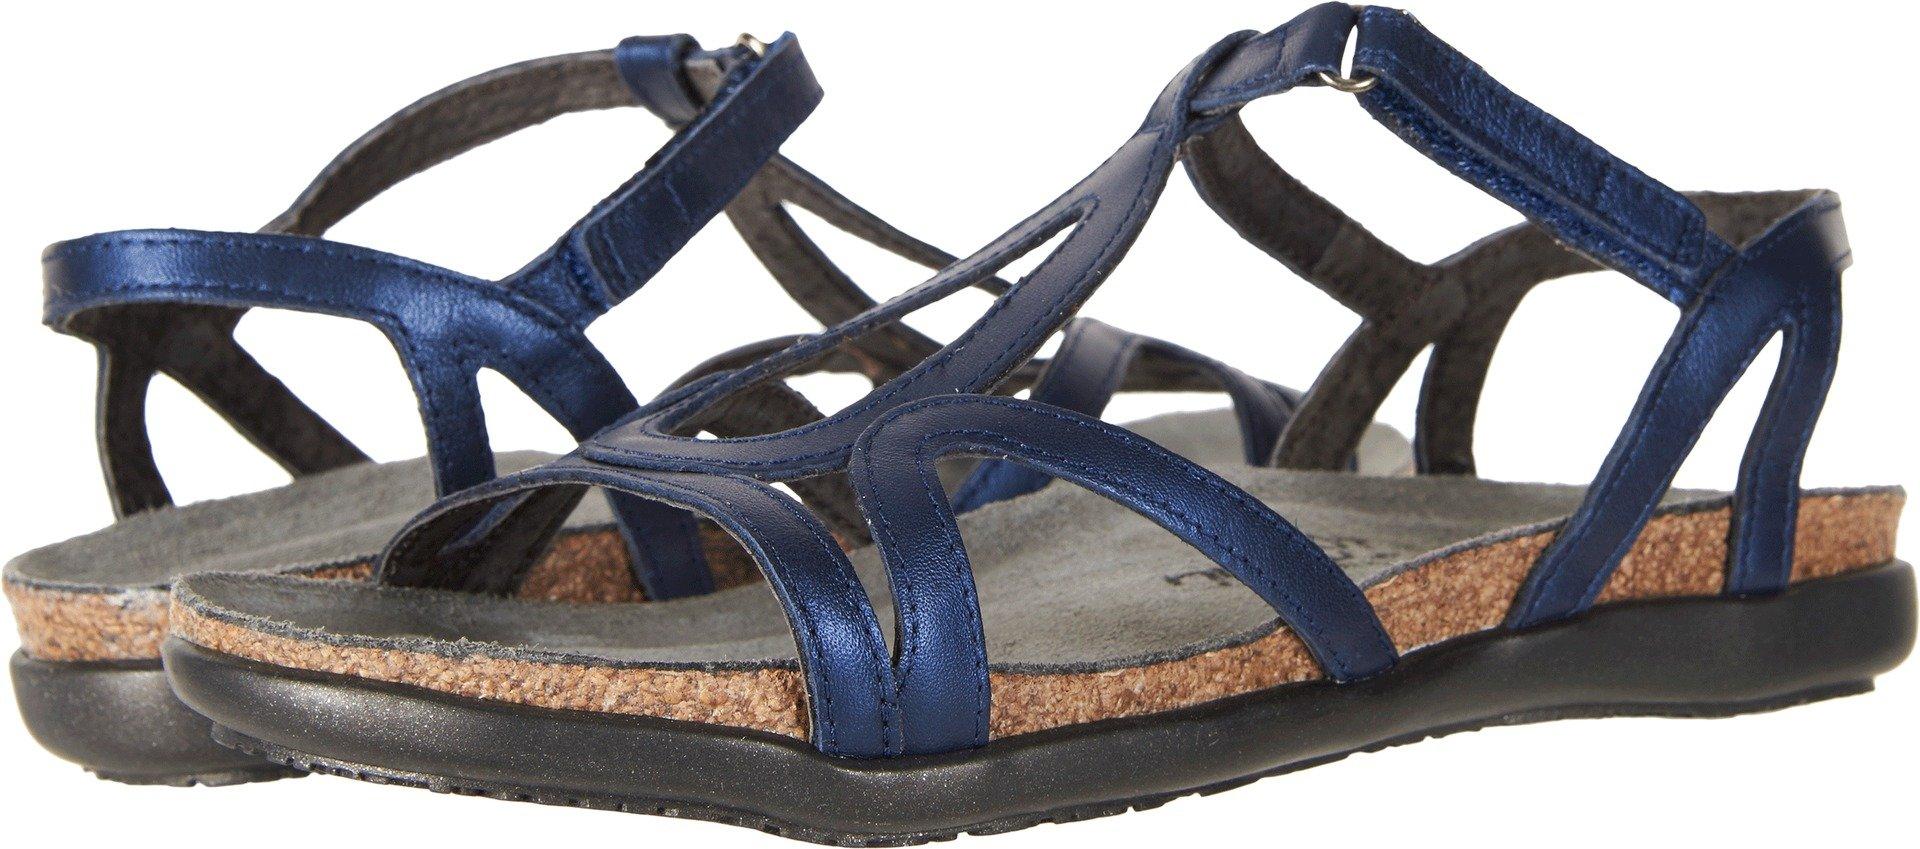 NAOT Women's Dorith Sandal Polar Sea Leather Size 38 EU (7.5-8 M US Women) by NAOT